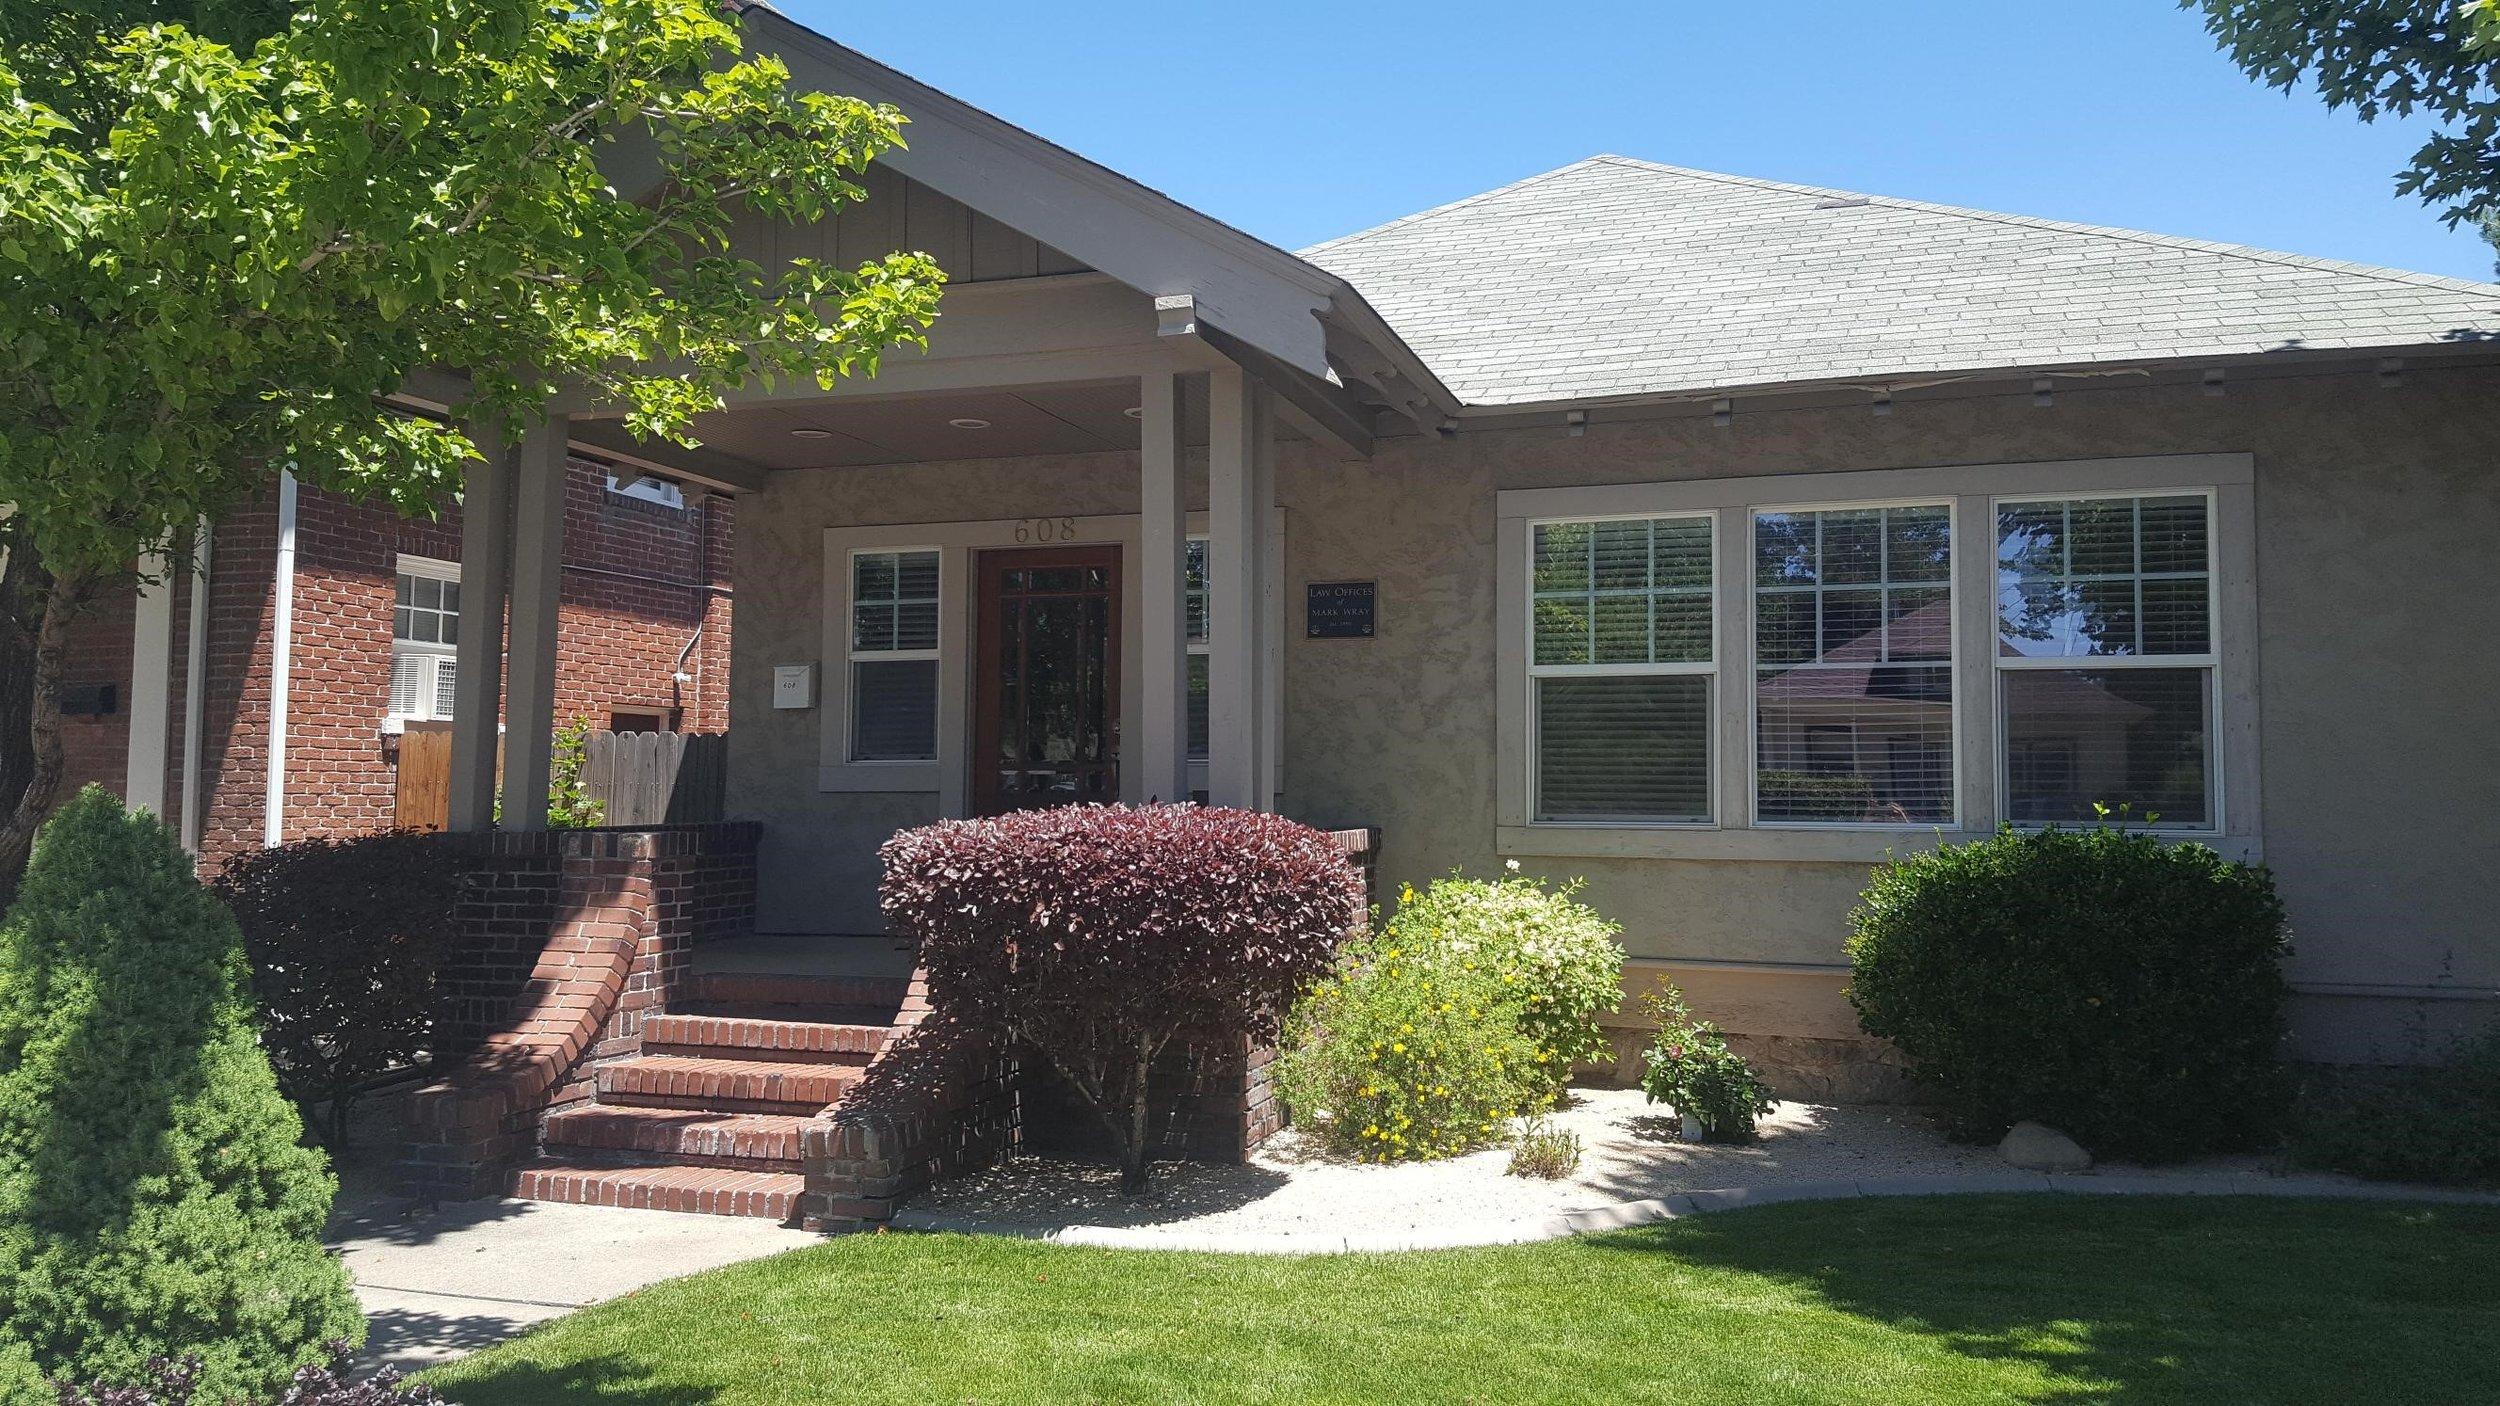 Law Offices of Mark Wray, 608 Lander Street, Reno, NV